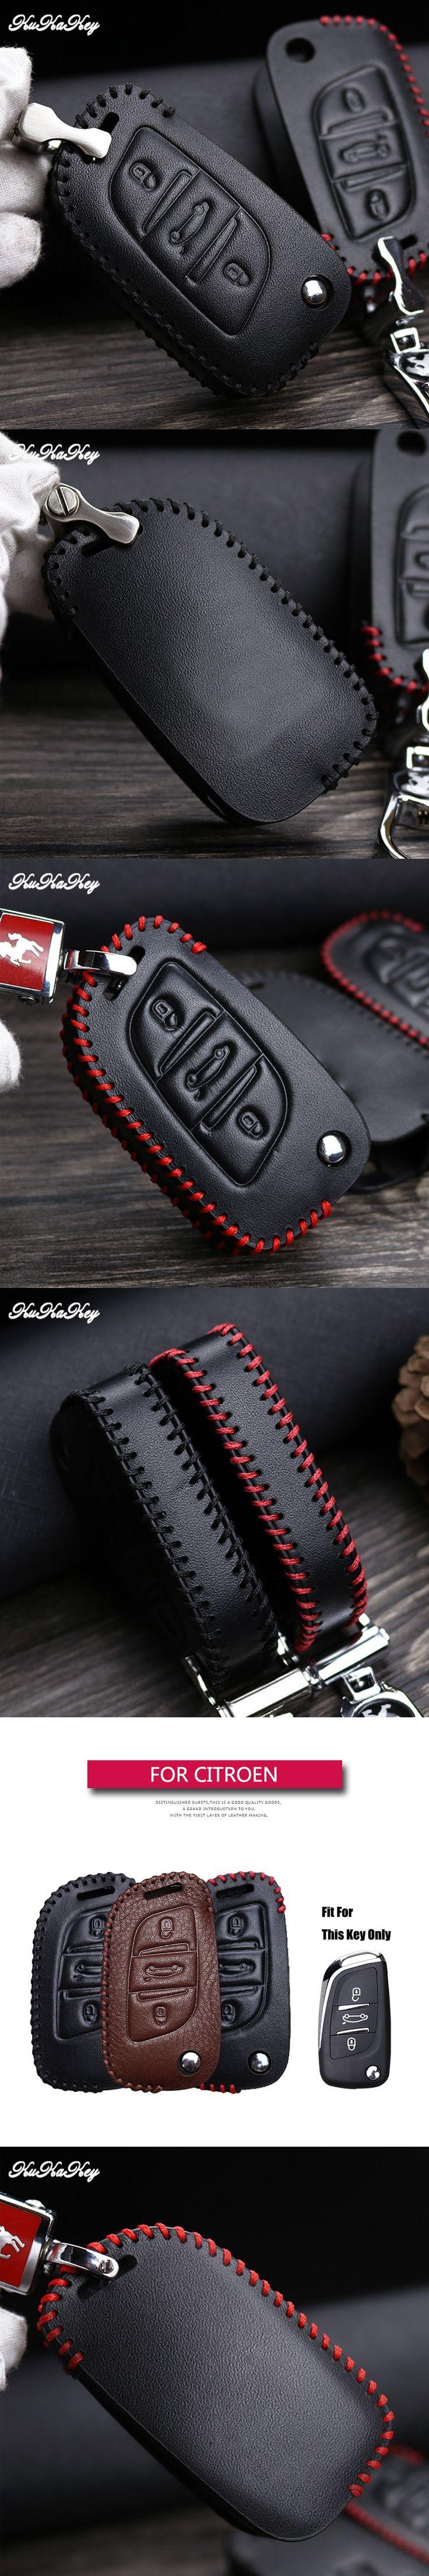 KUKAKEY For Citroen C2 C3 C4 Auto Car Key Case Leather Cover For Citroen C2 C3 C4 Coupe VTR Berlingo C6 C8 Key Coldre Cover Bag